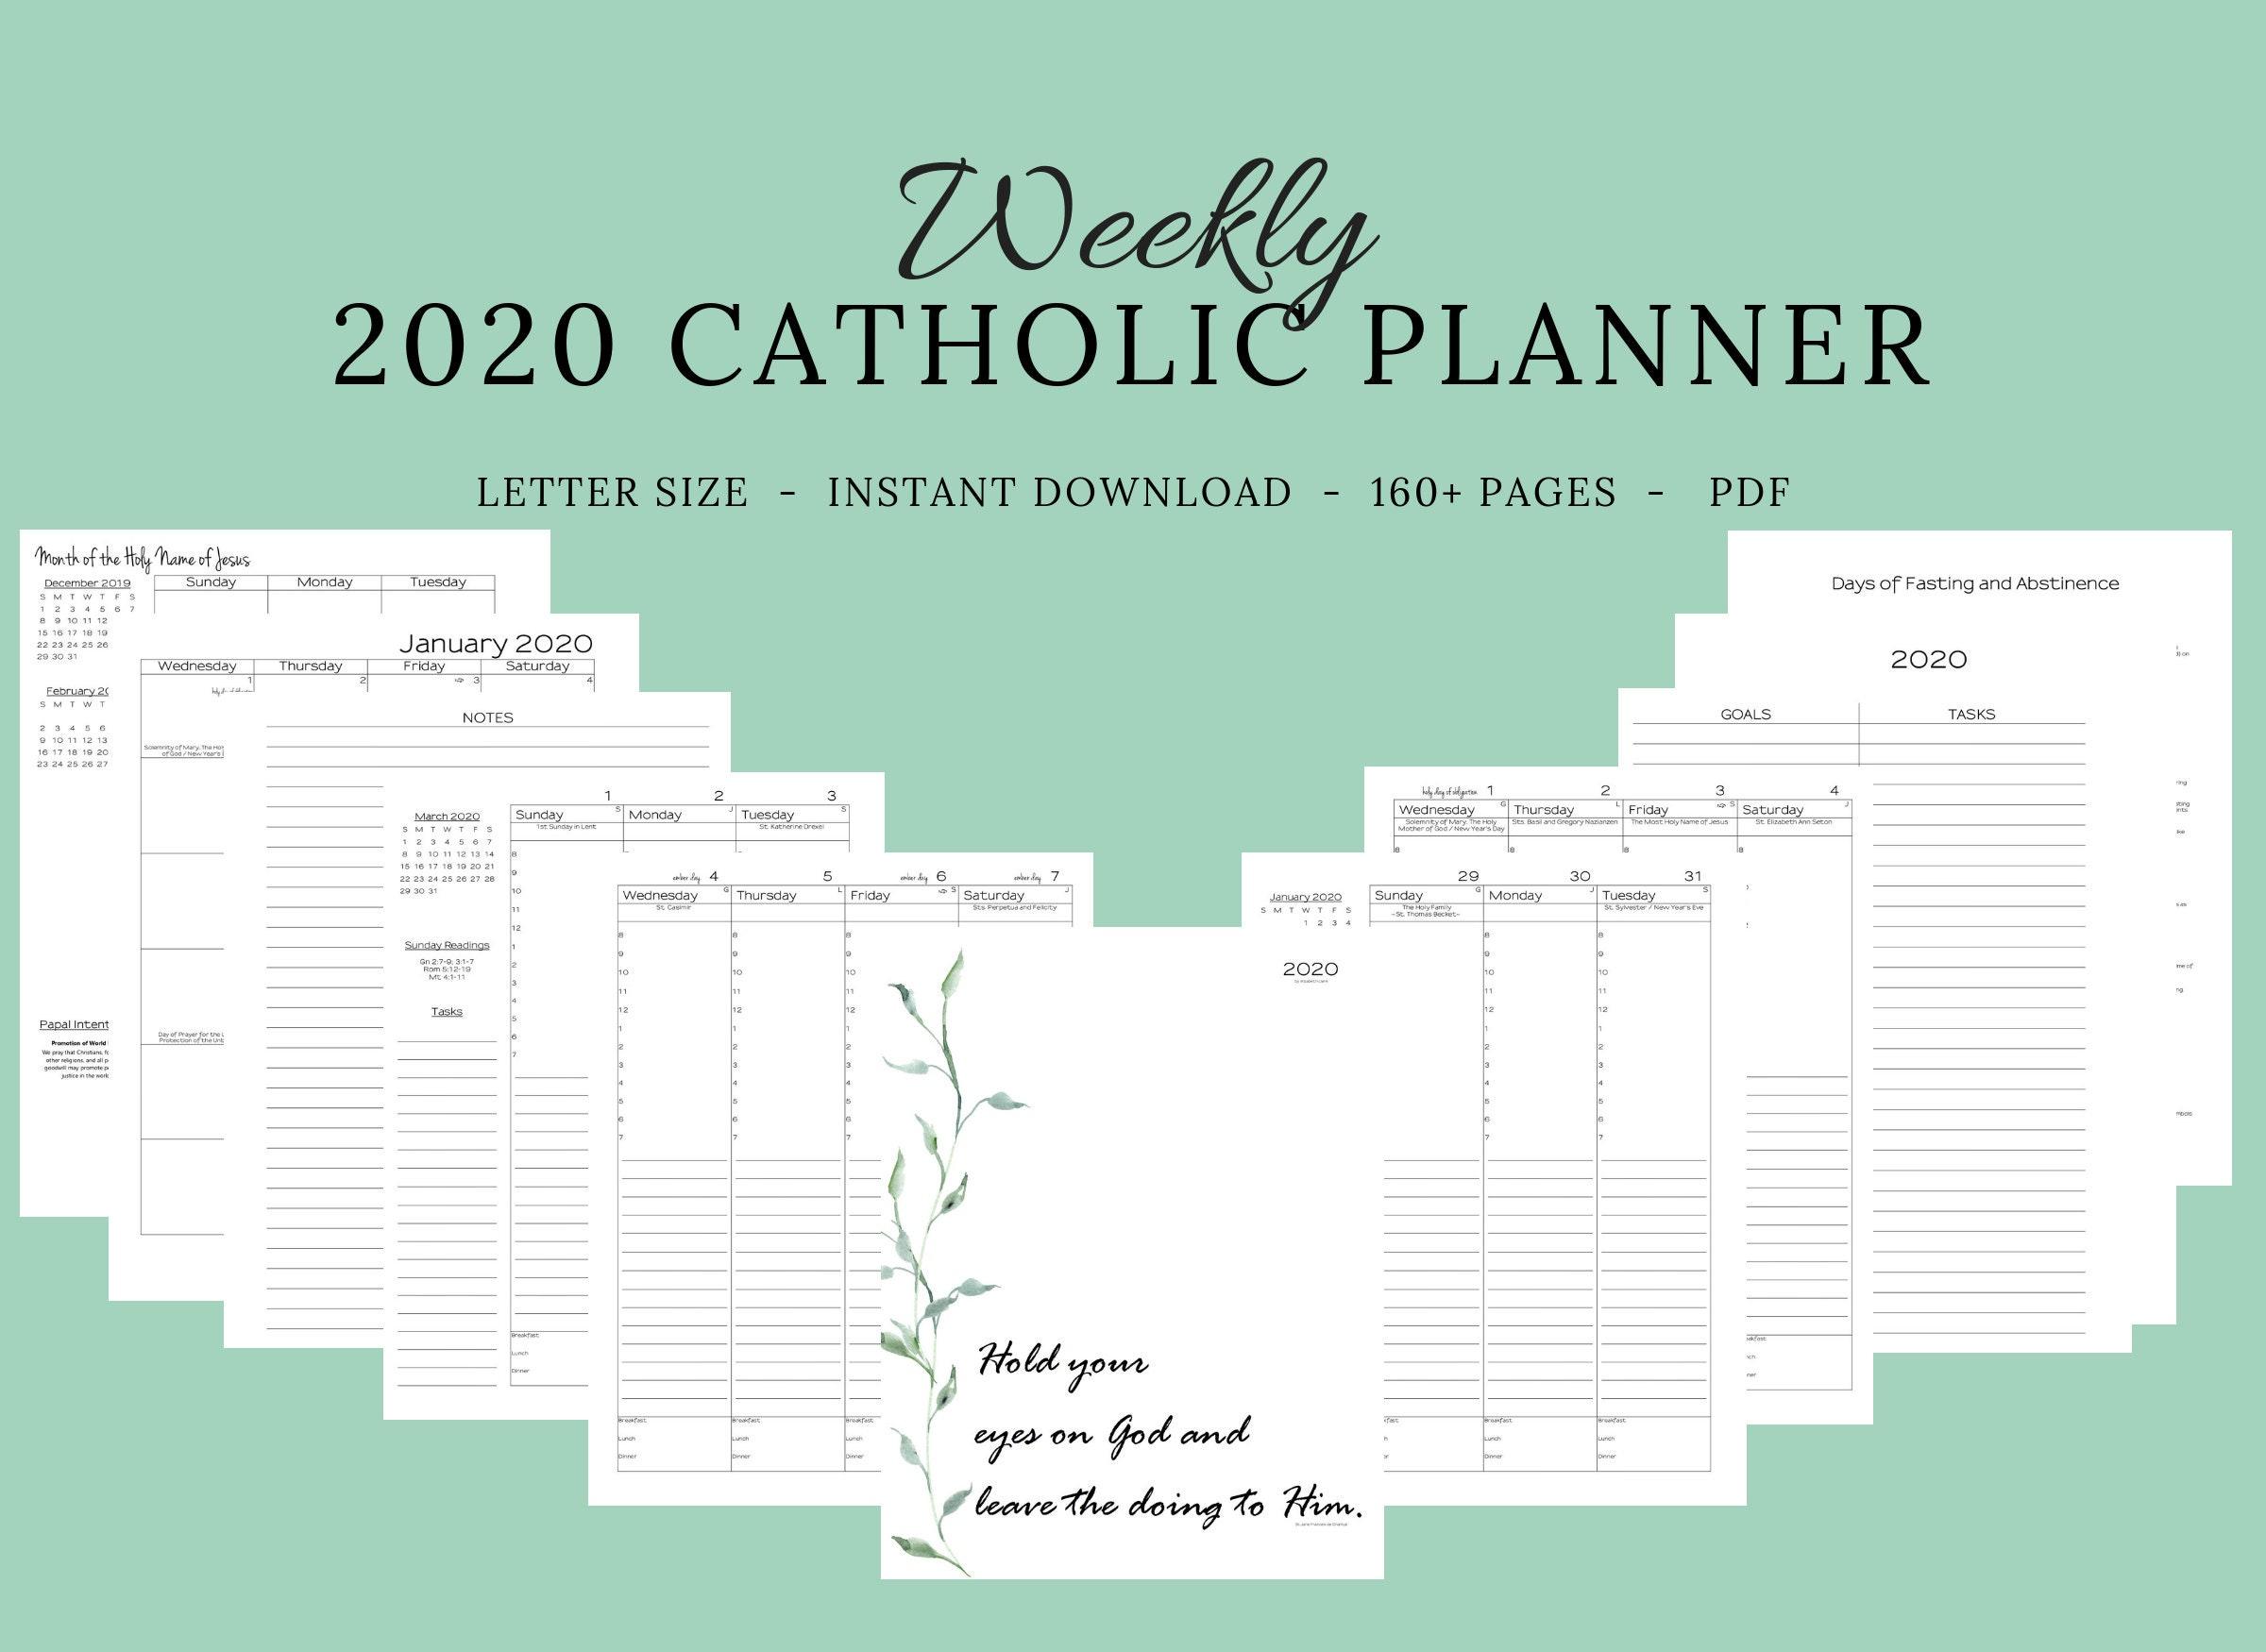 December 31 2020 Liturgical Calendar 2020 Catholic Planner Weekly Printable: Daily Planner /   Etsy